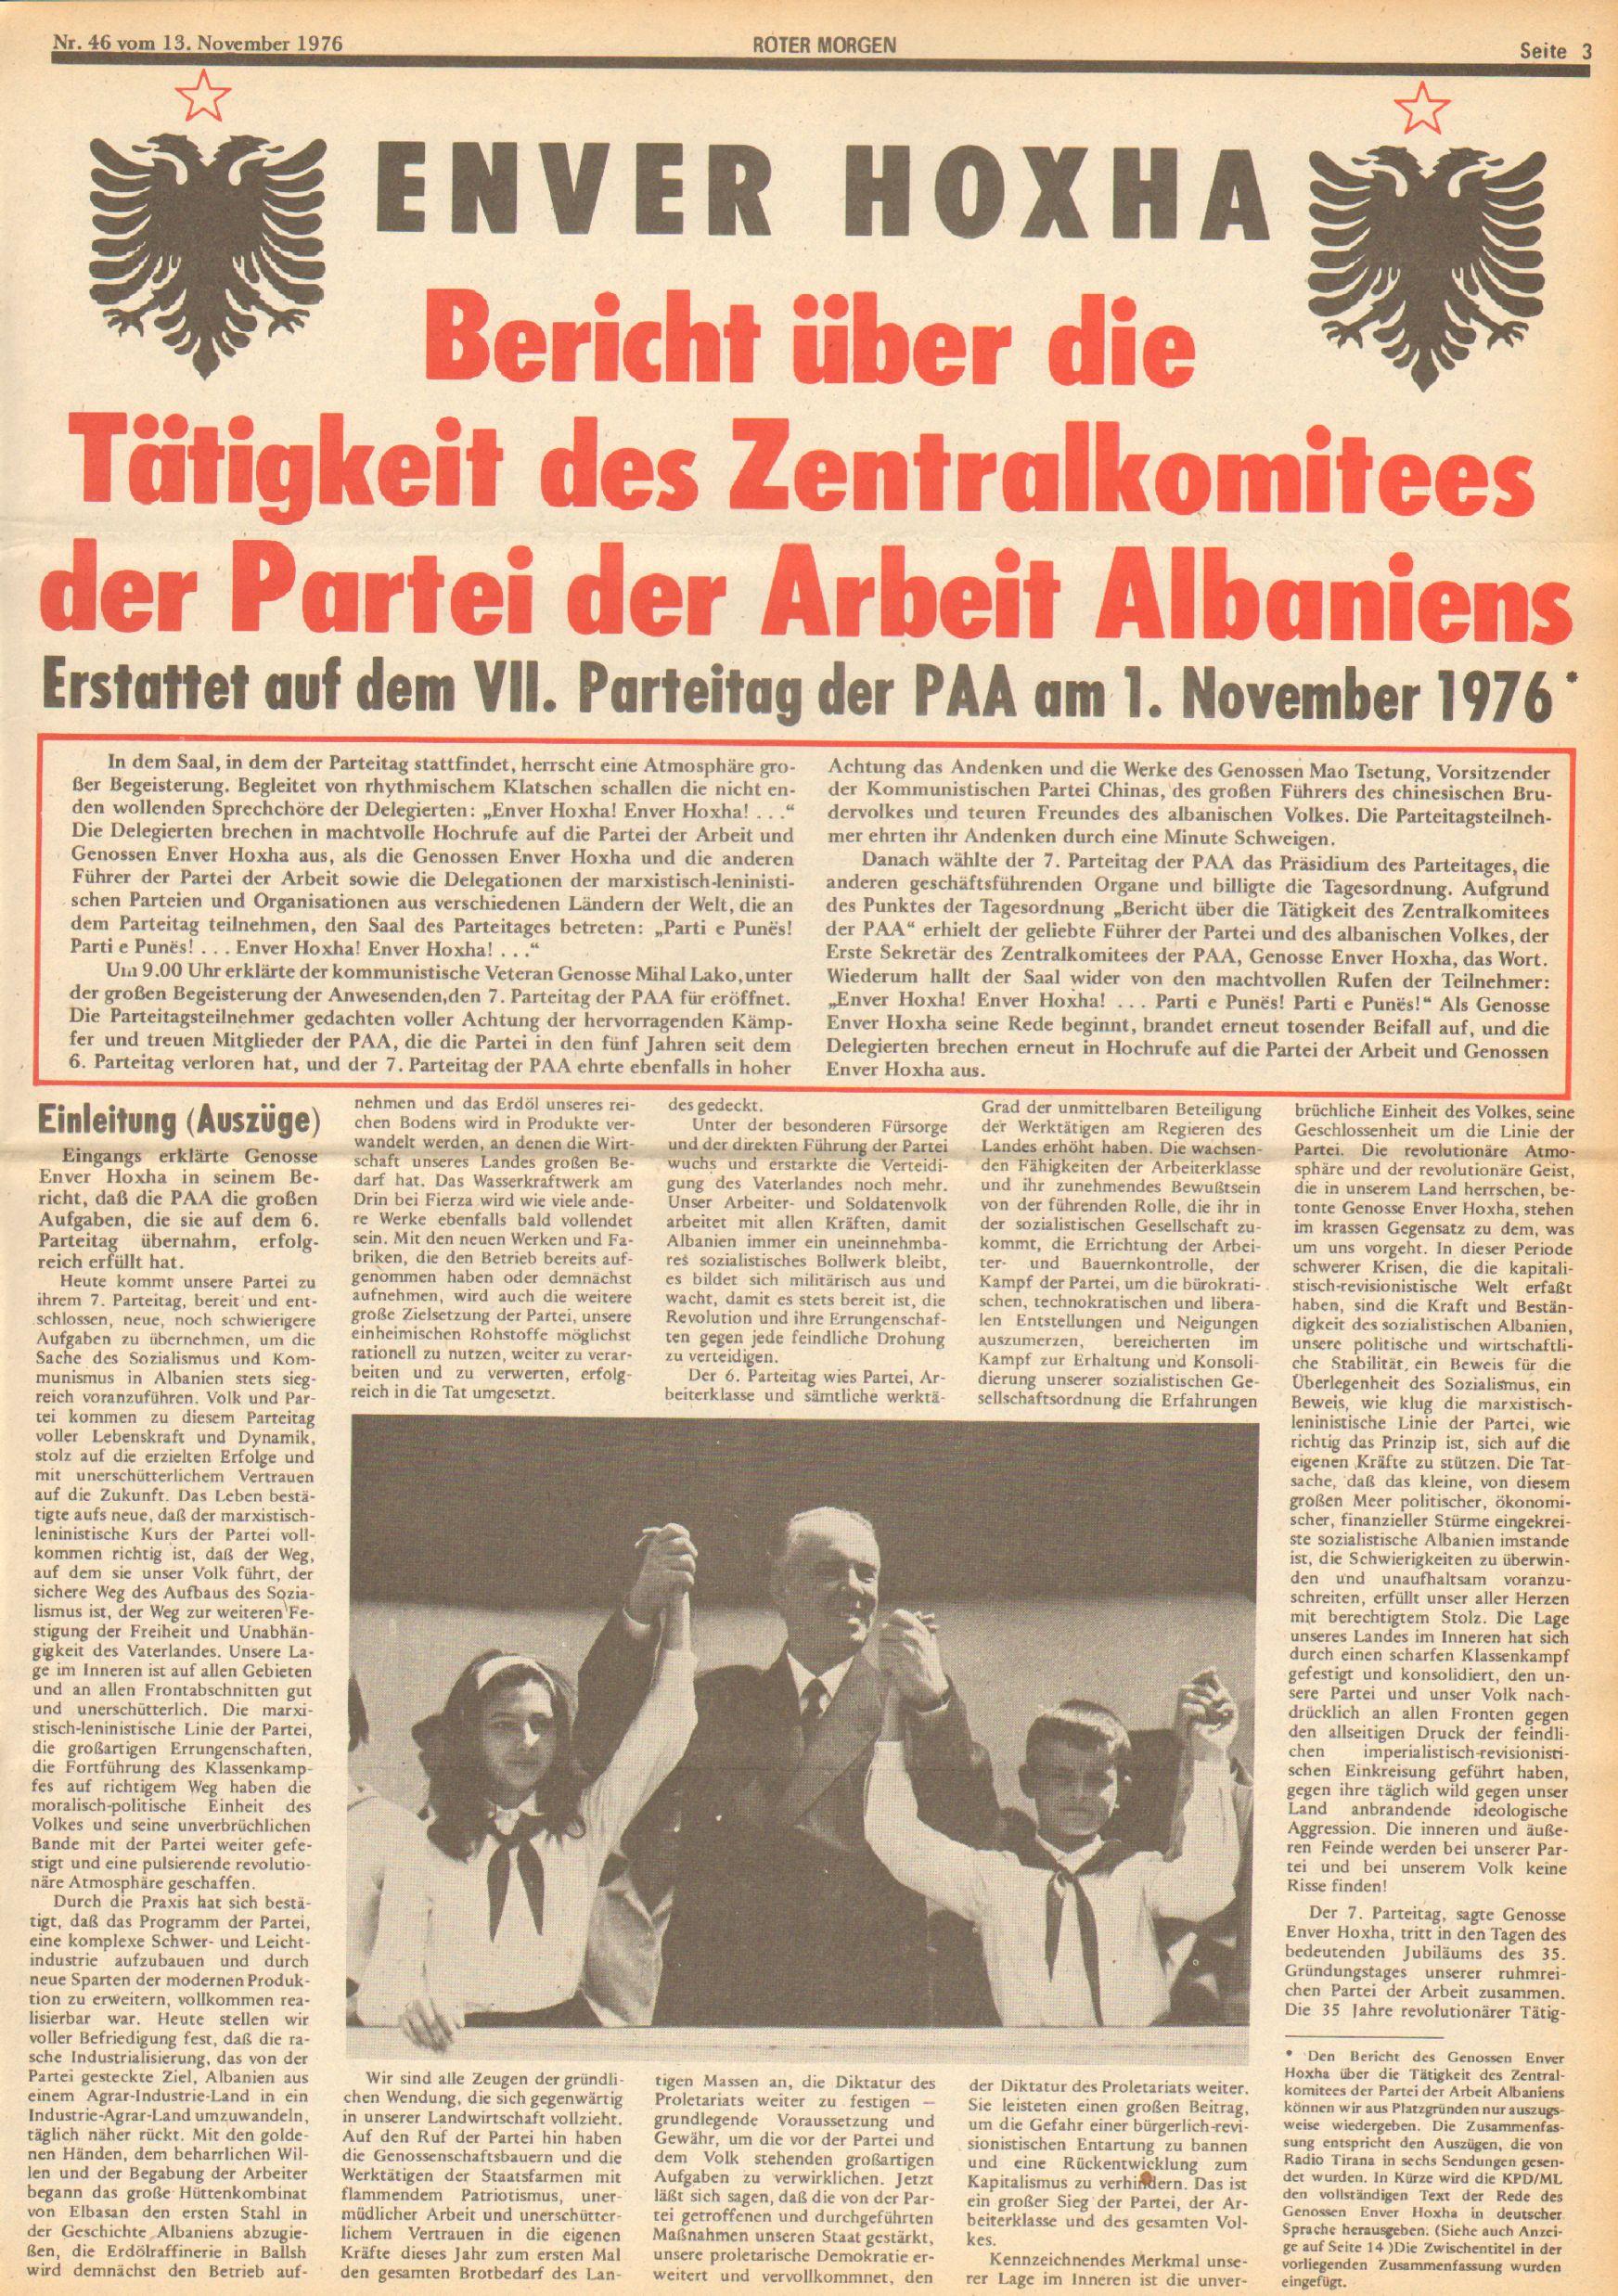 Roter Morgen, 10. Jg., 13. November 1976, Nr. 46, Seite 3